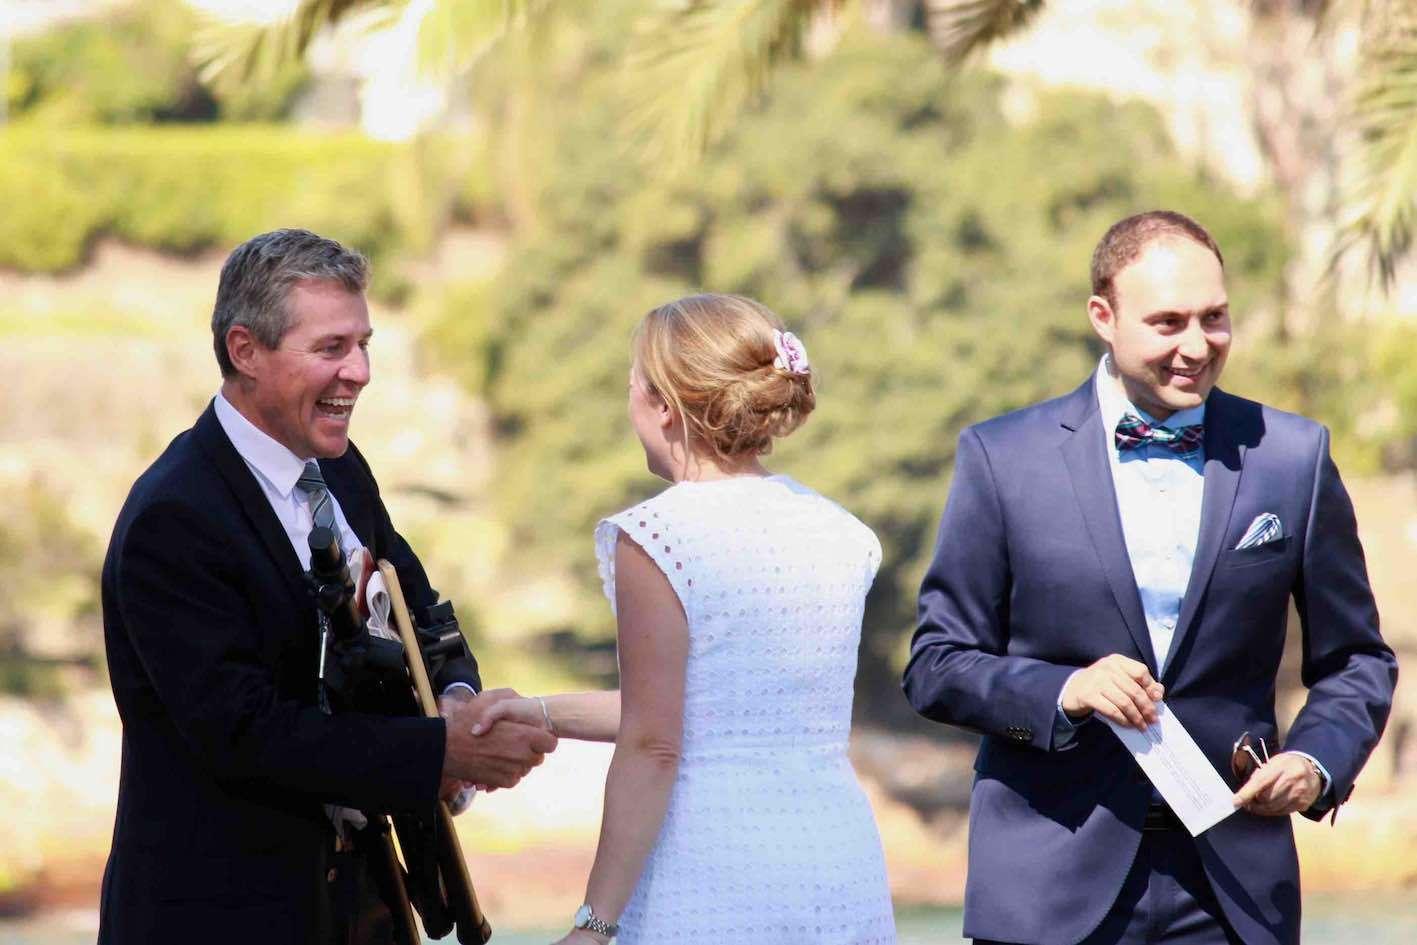 Simple-Ceremonies_Marriage Celebrant_Wedding-celebrant_Bradfield Park_North Sydney_NSW_Australia_SydneyHarbourweddingscheap10112